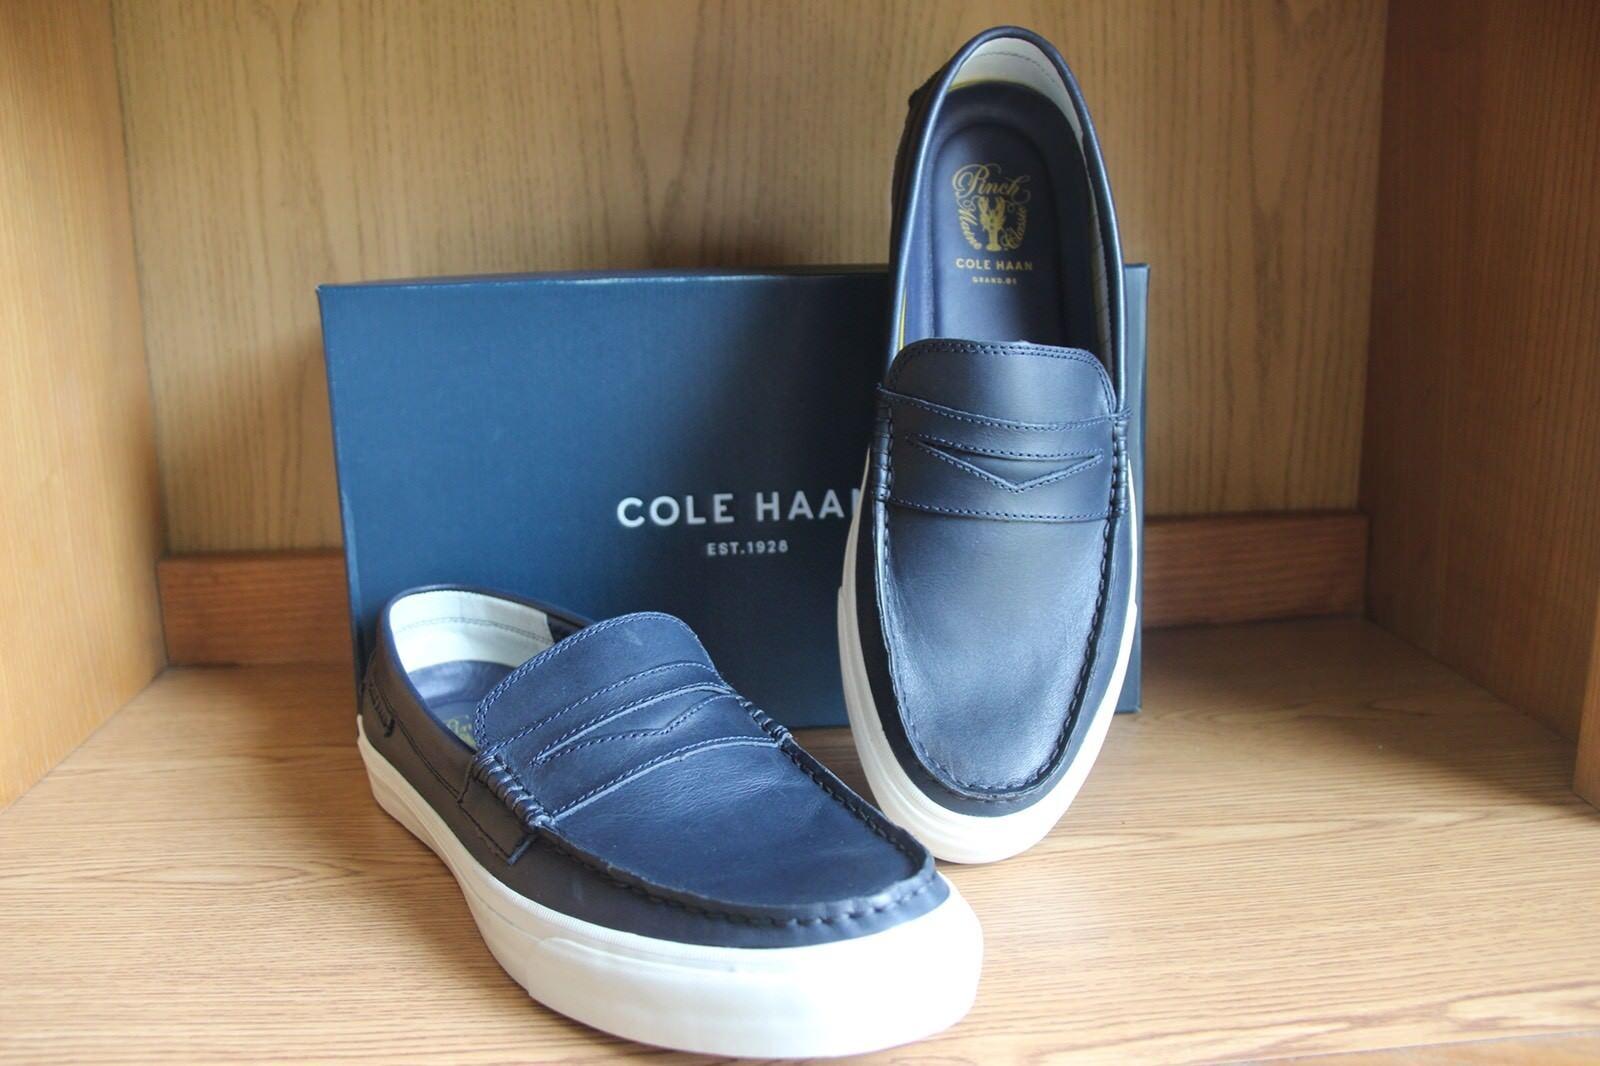 Scarpe casual da uomo  Cole Haan Pinch Weekender Navy Handstained Loafer Shoe uomo Size 11.5 C27243